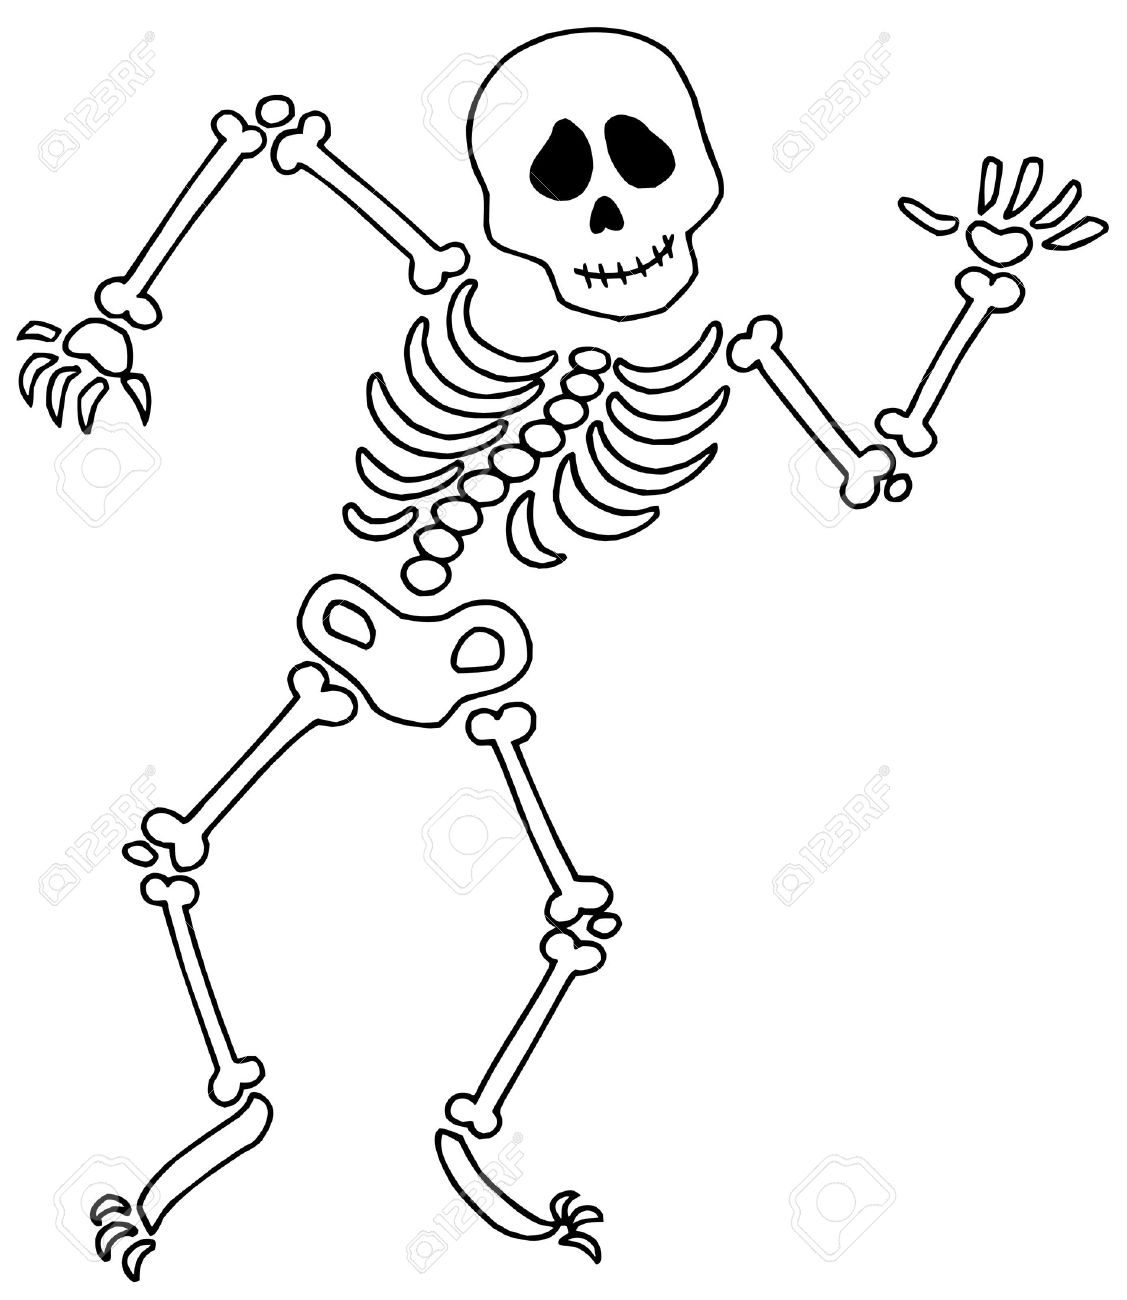 Bones Clipart Bones Transparent Free For Download On